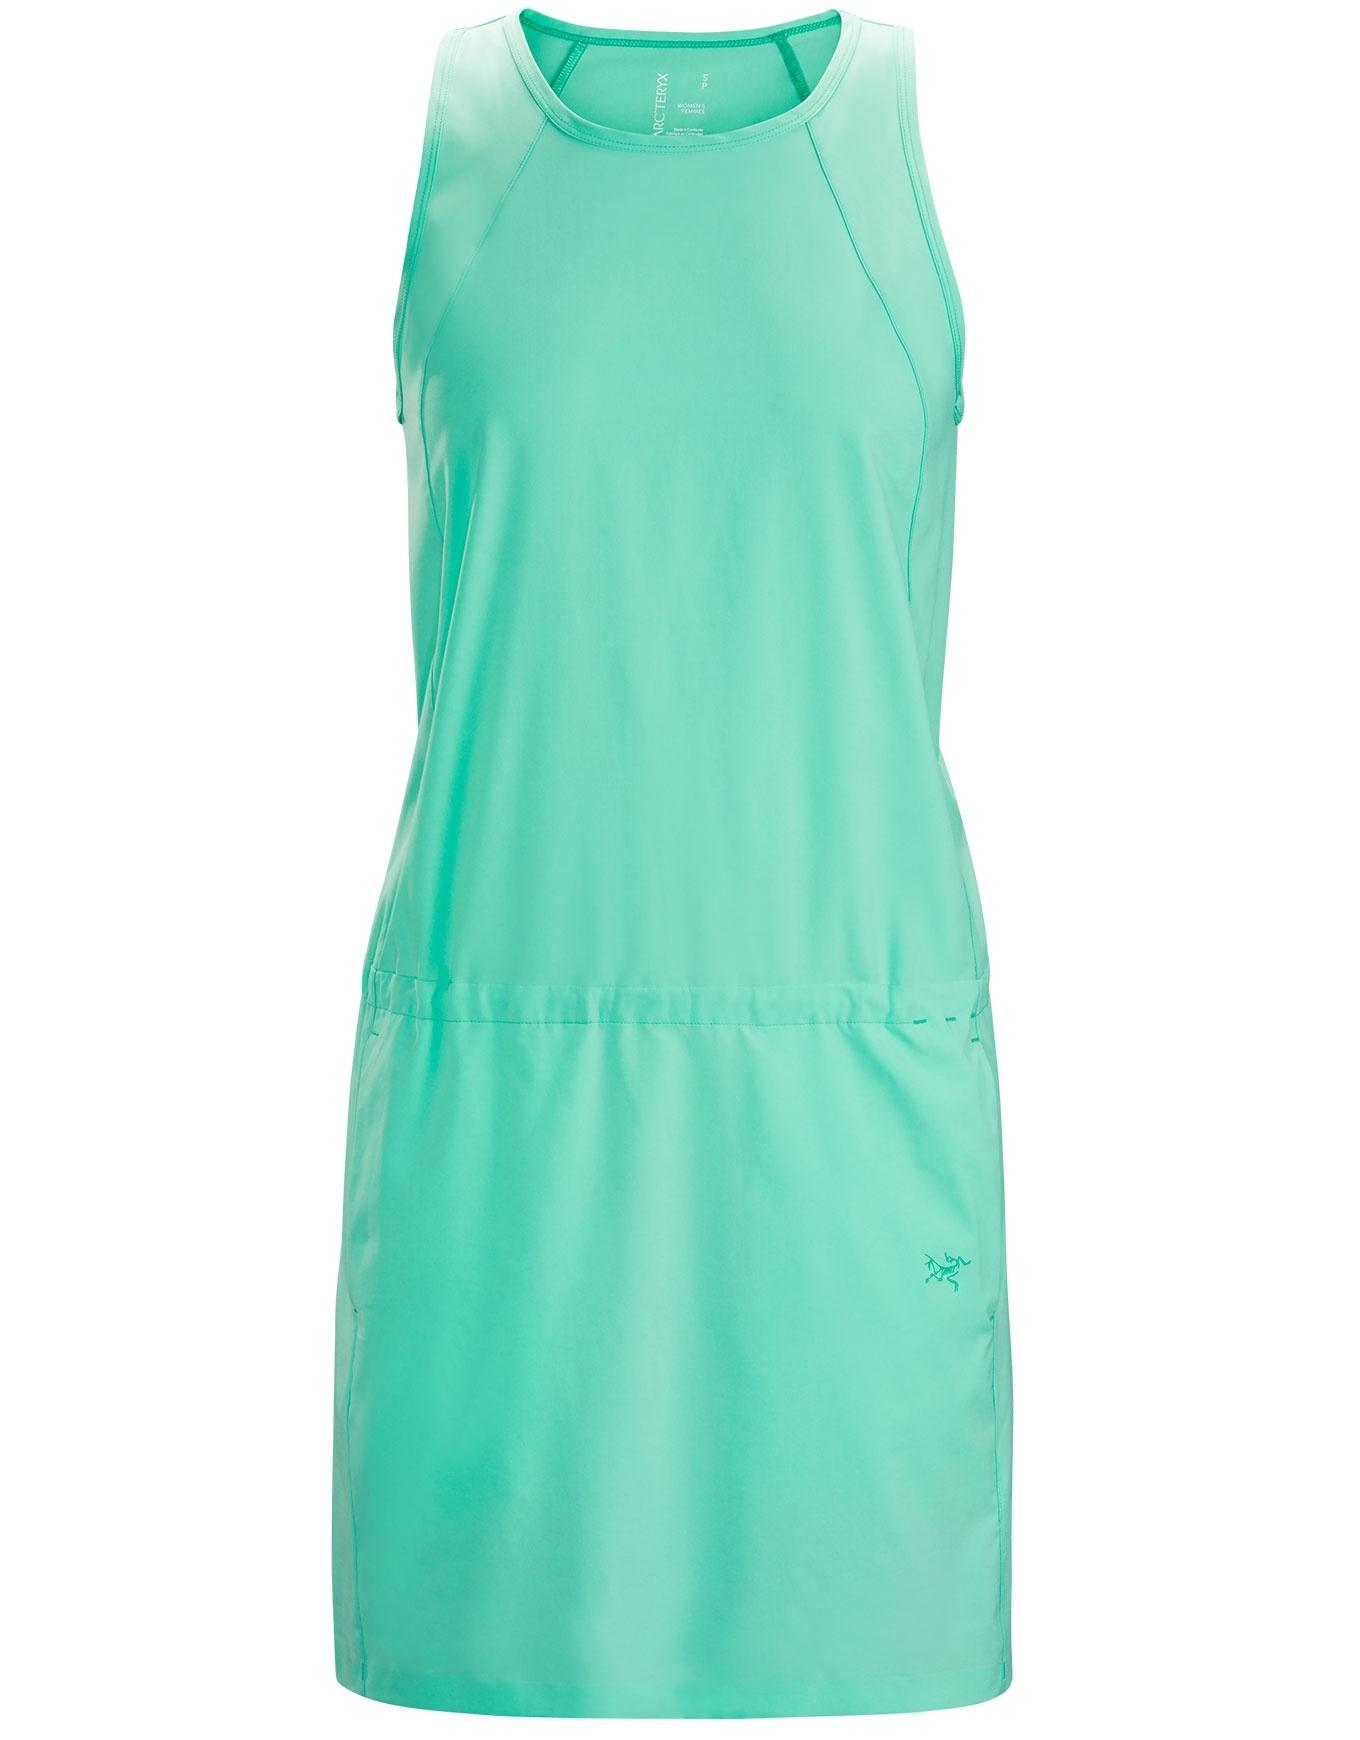 Arcteryx Women's Contenta Dress